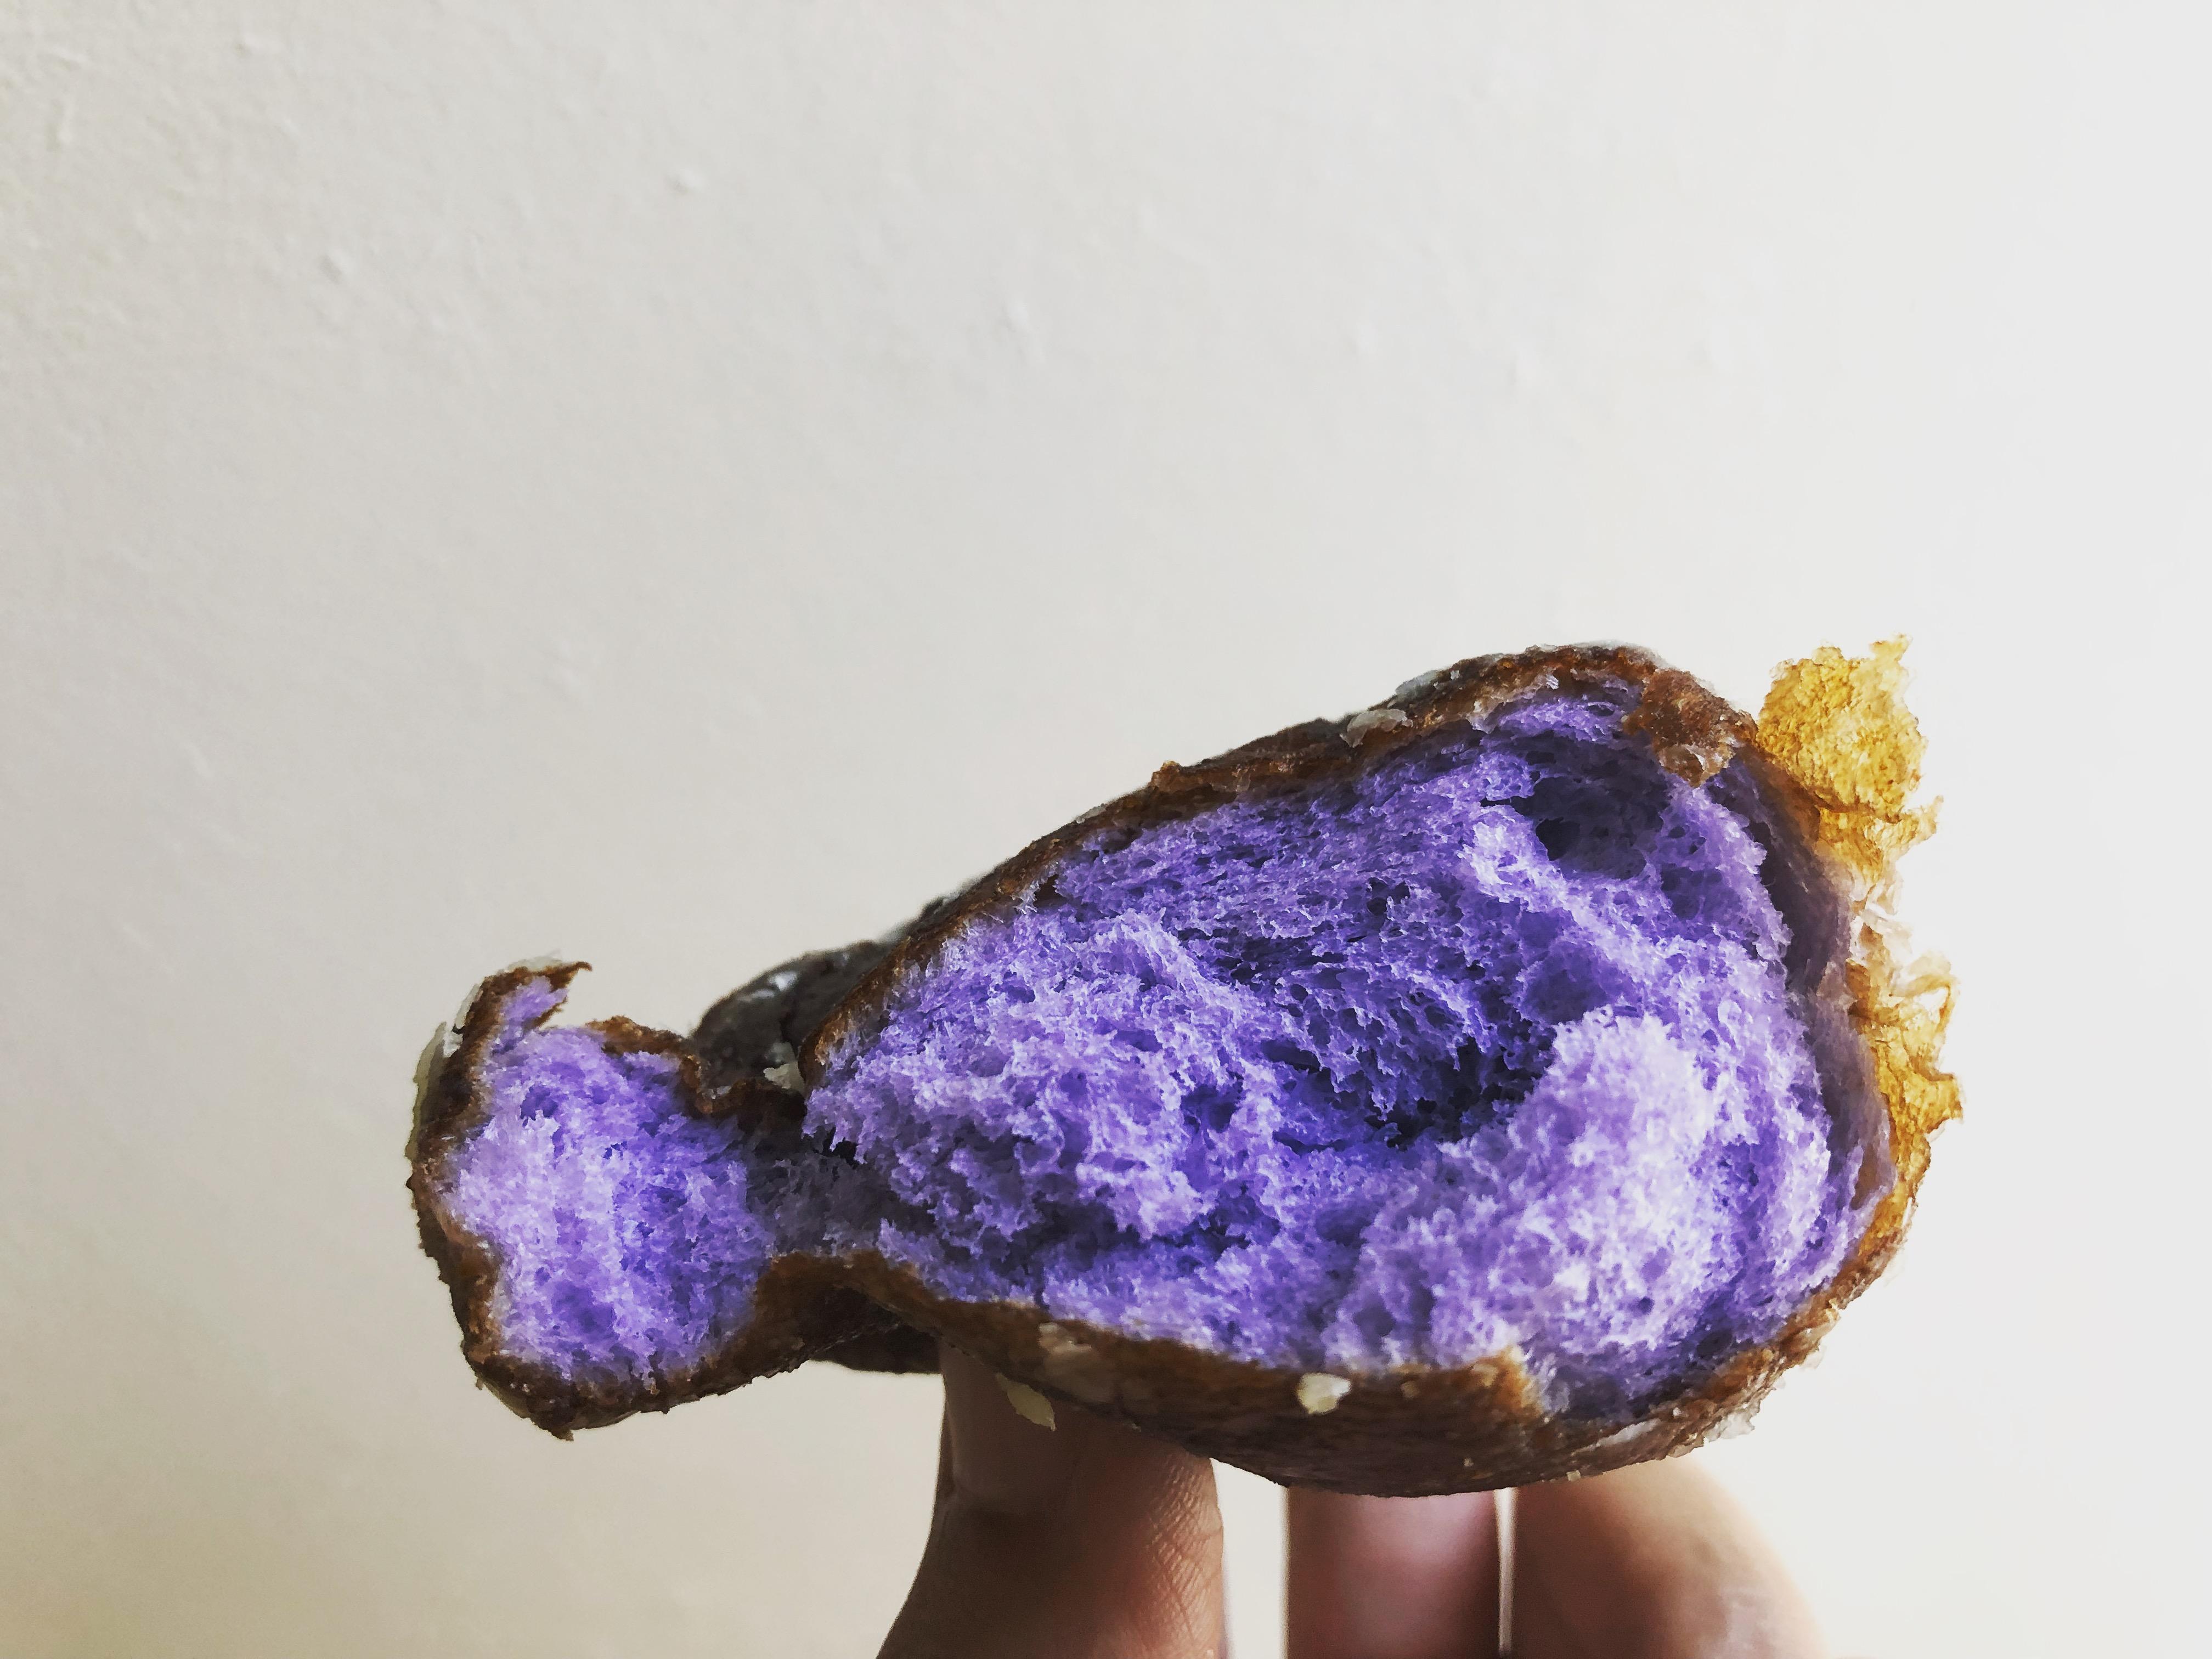 Kamehameha Bakery.